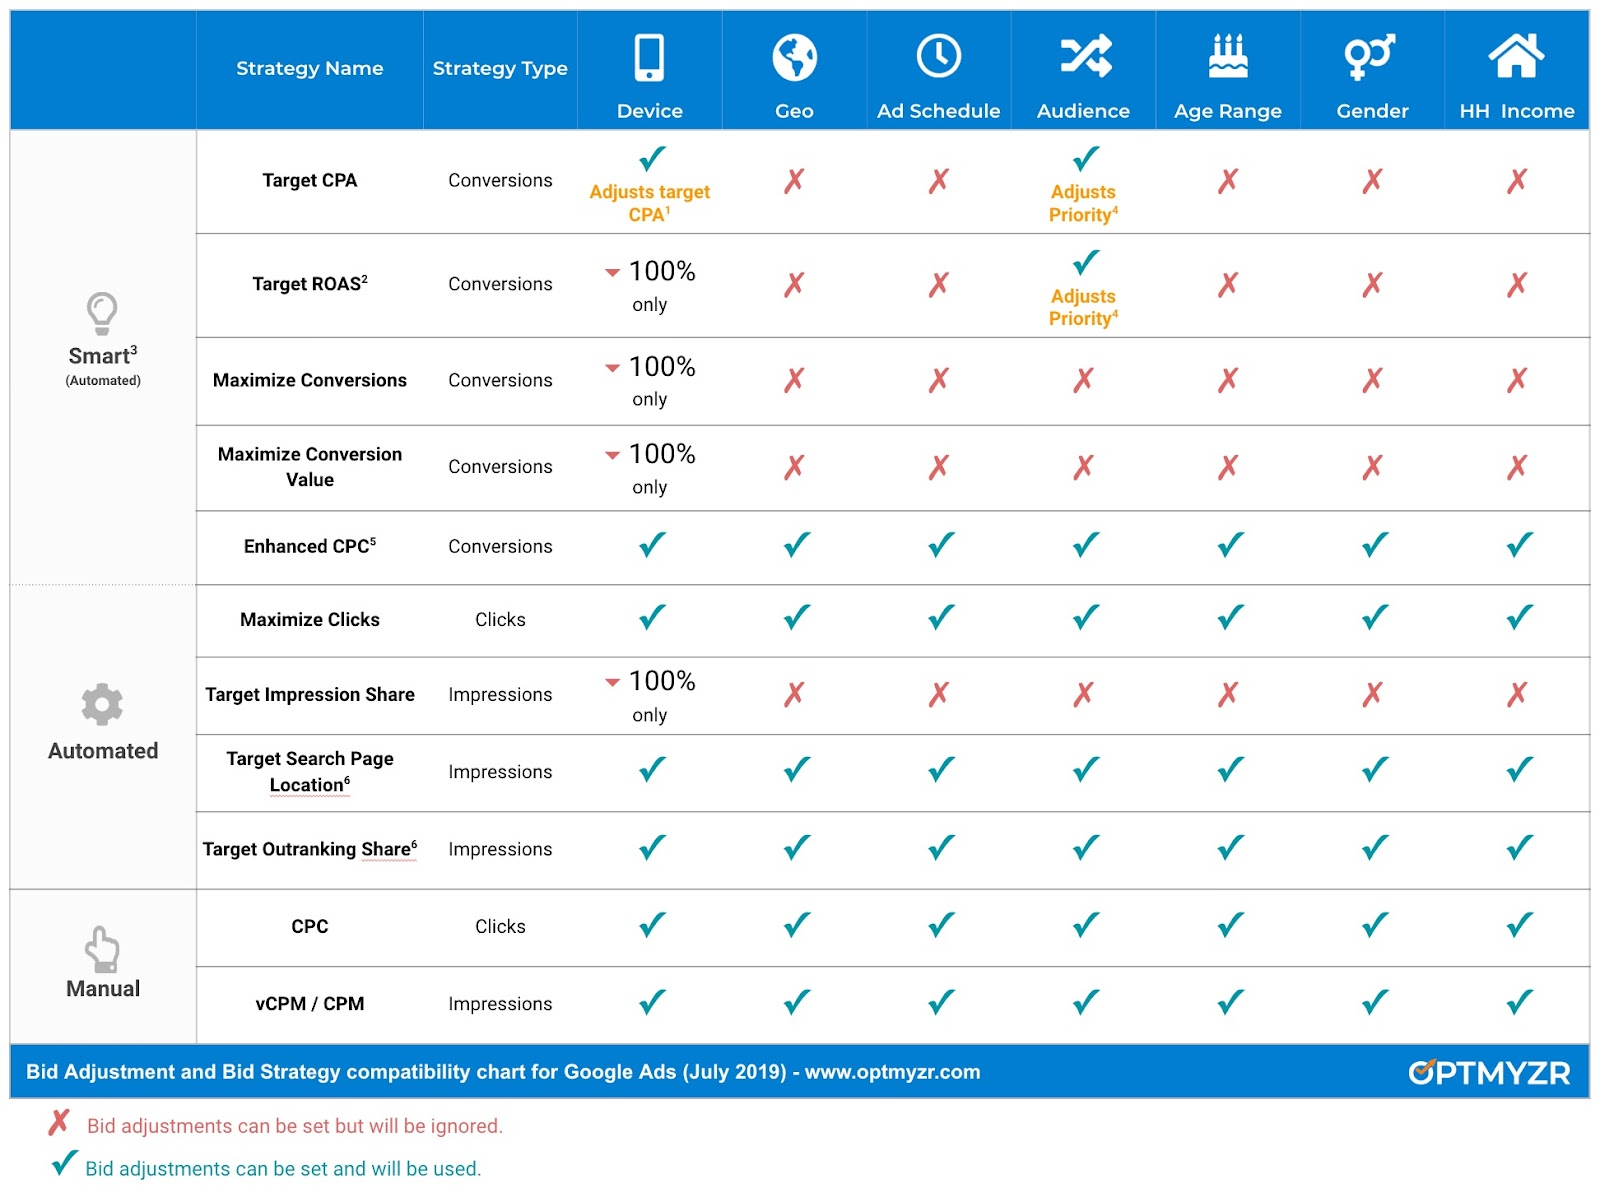 Bid Adjustment and Bid Strategy compatibility chart for Google Ads (July 2019)